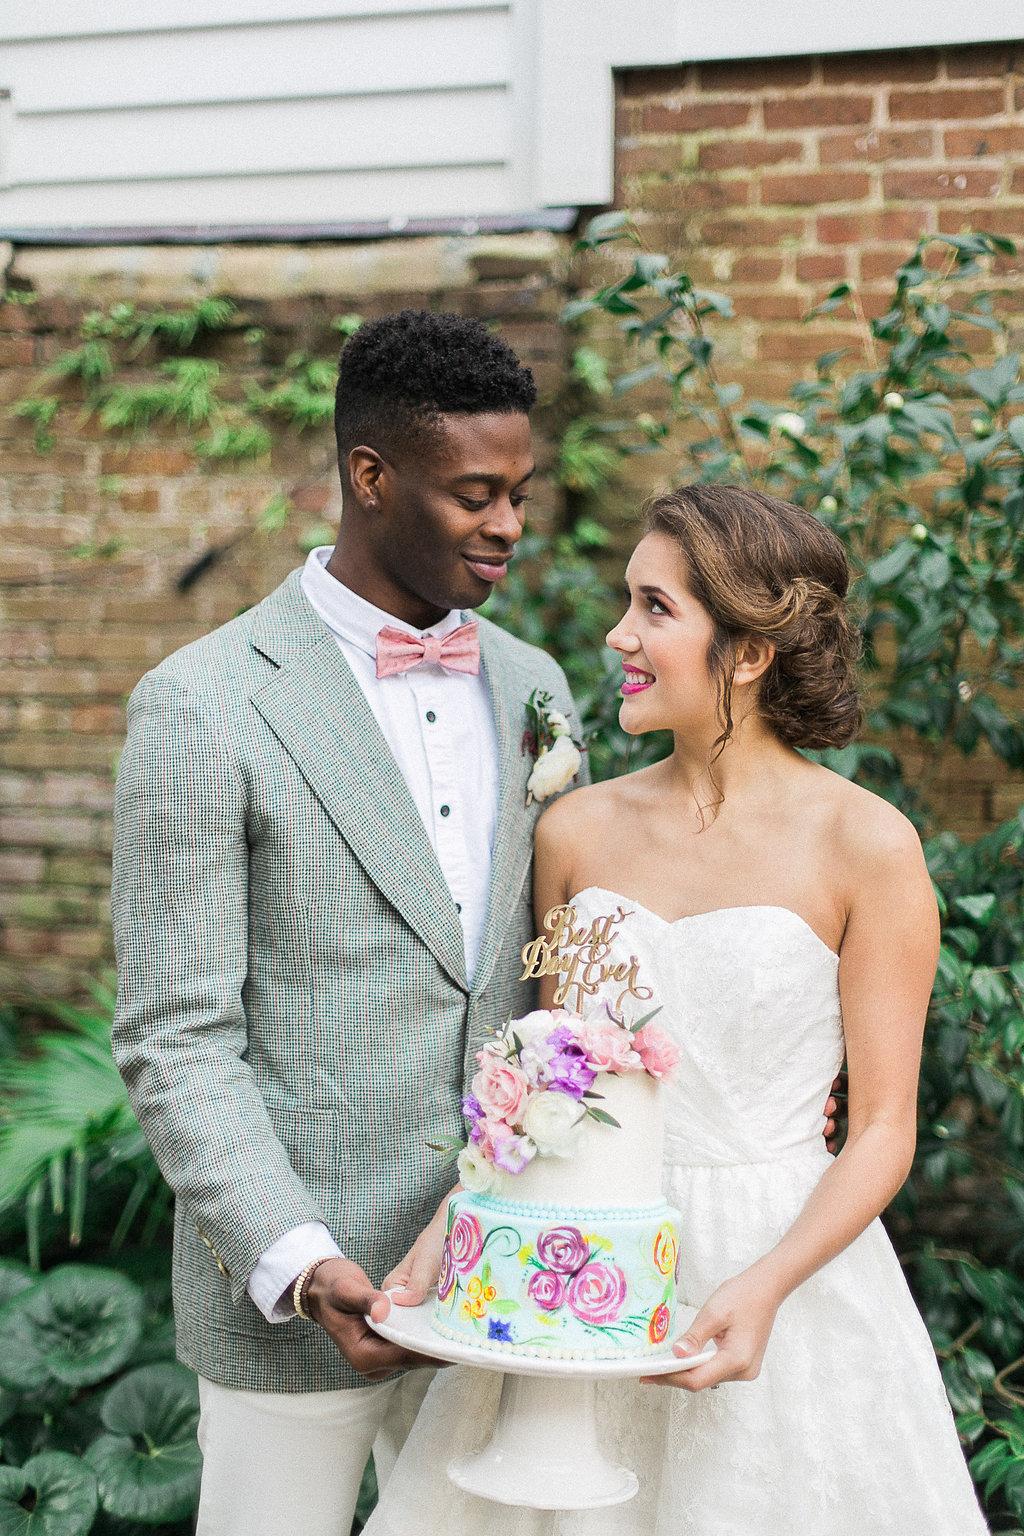 charleston spring brunch elopement pop up wedding planners at the parsonage - atlanta, greenville wedding planners - scarlet plan & design (545).jpg